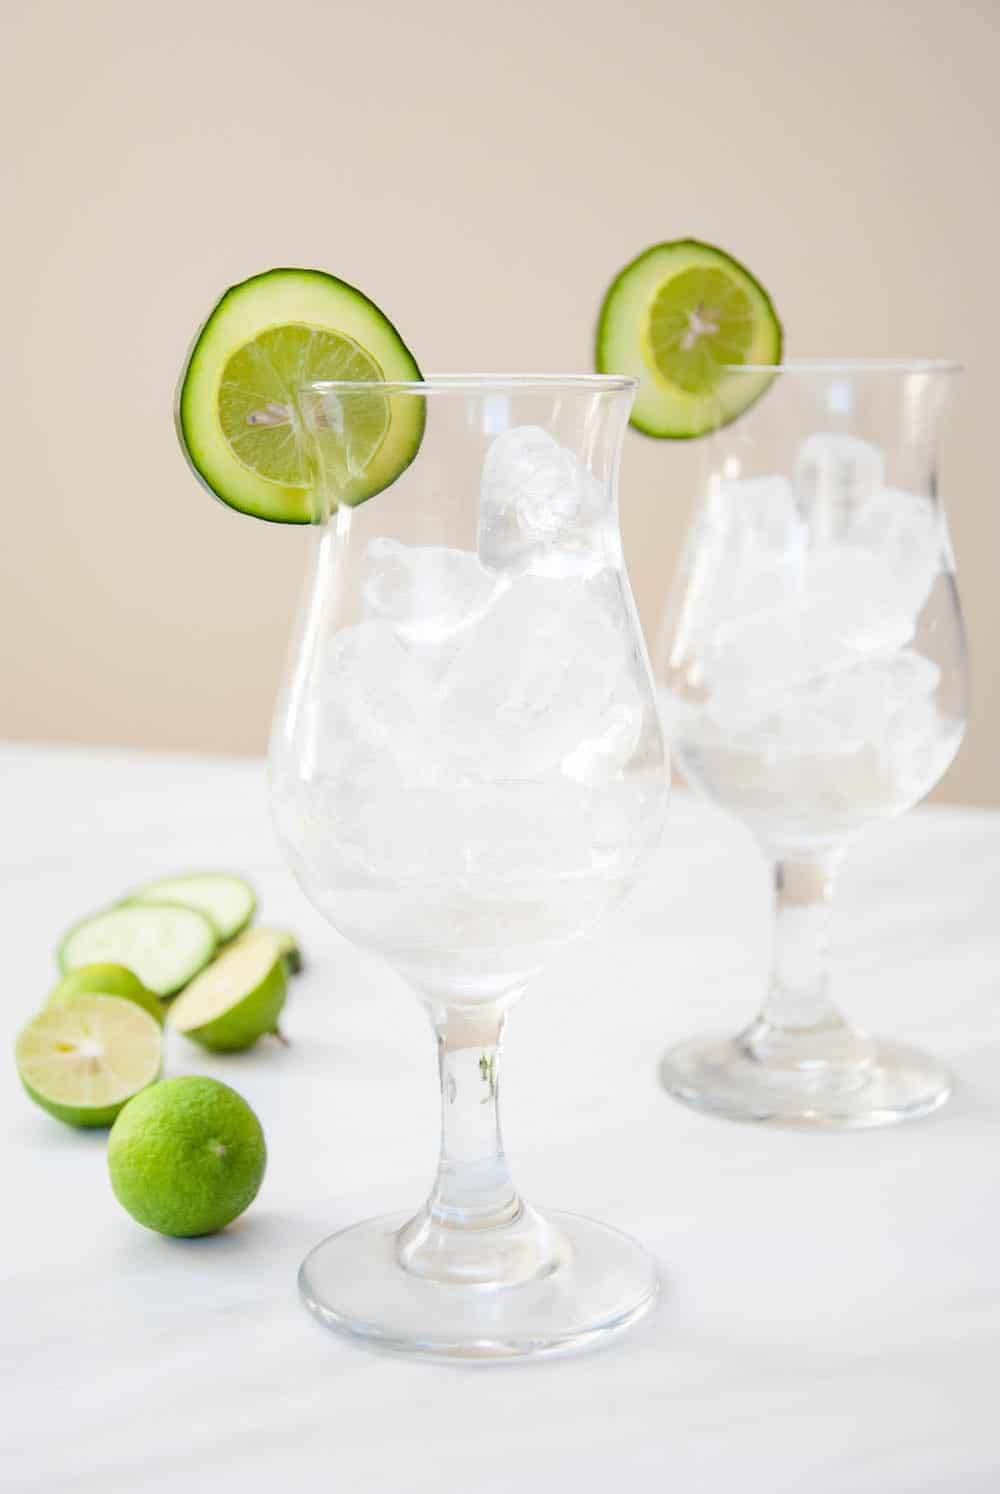 Island-Inspired Edible Cocktail Garnish: Cucumber + Key Lime